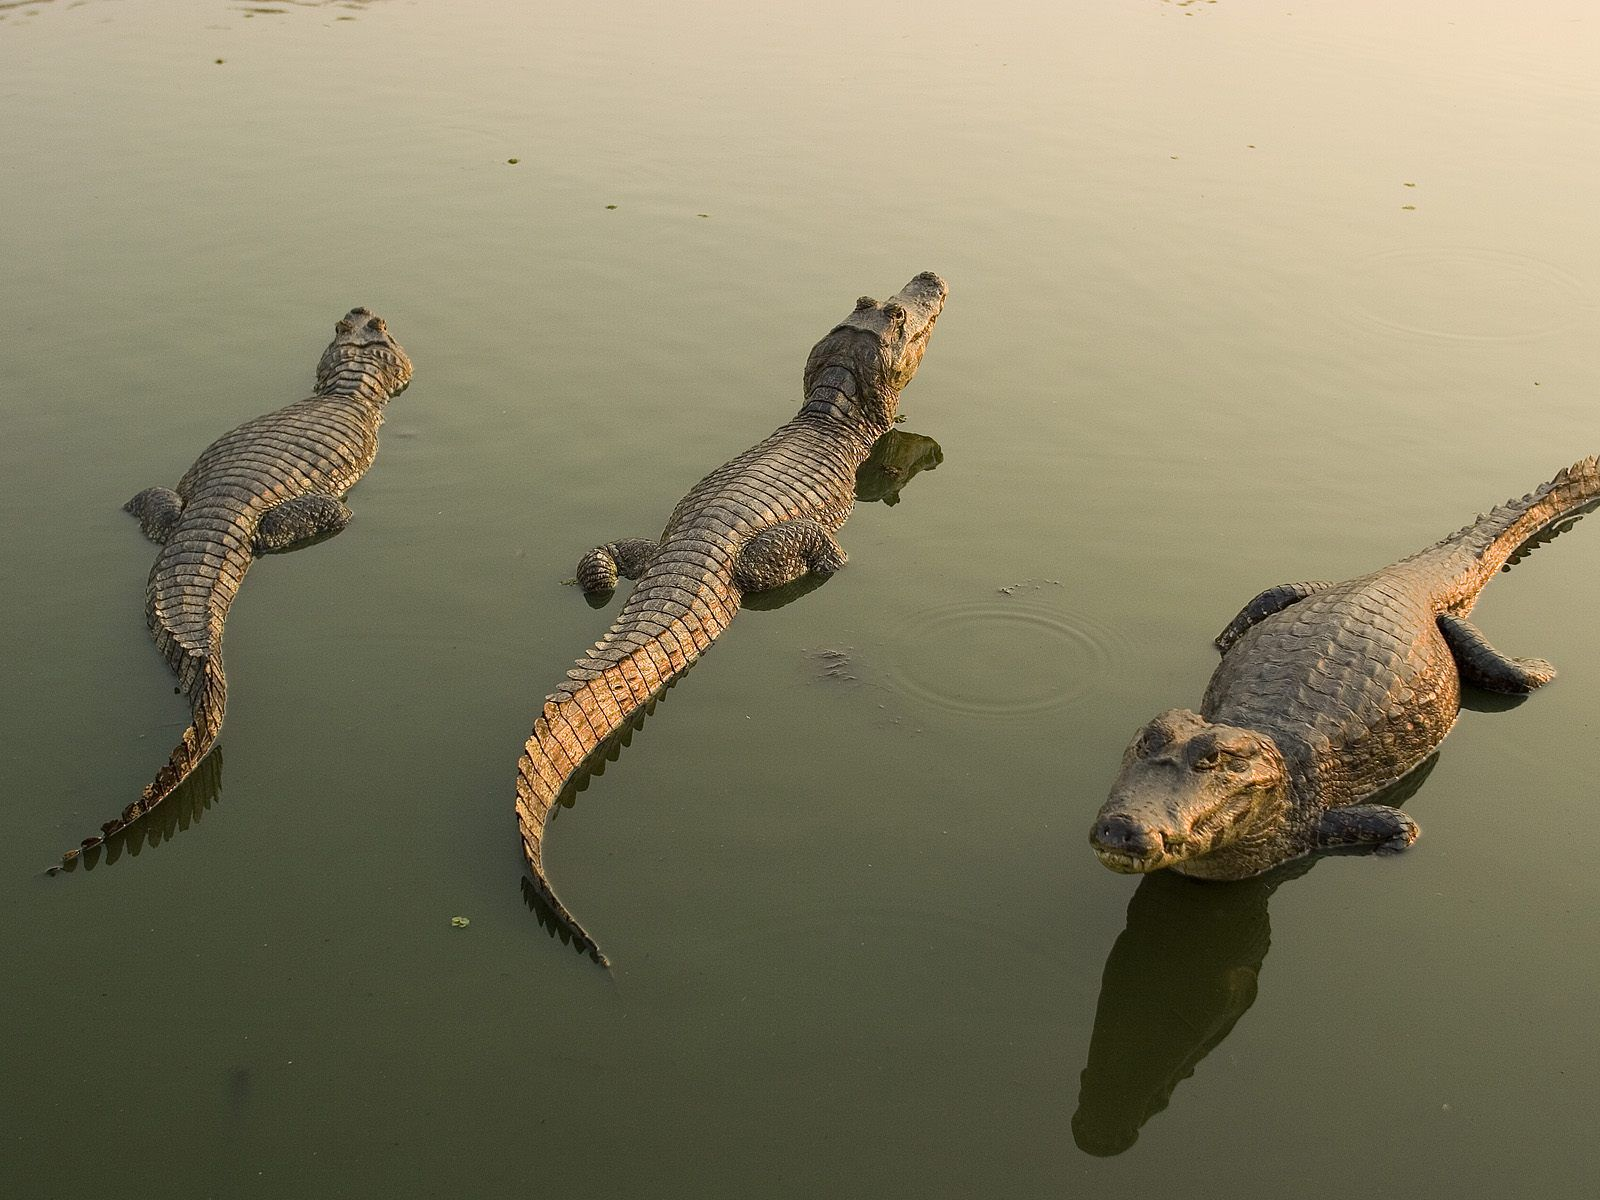 Alligators Crocodile Images Crocodiles Animals